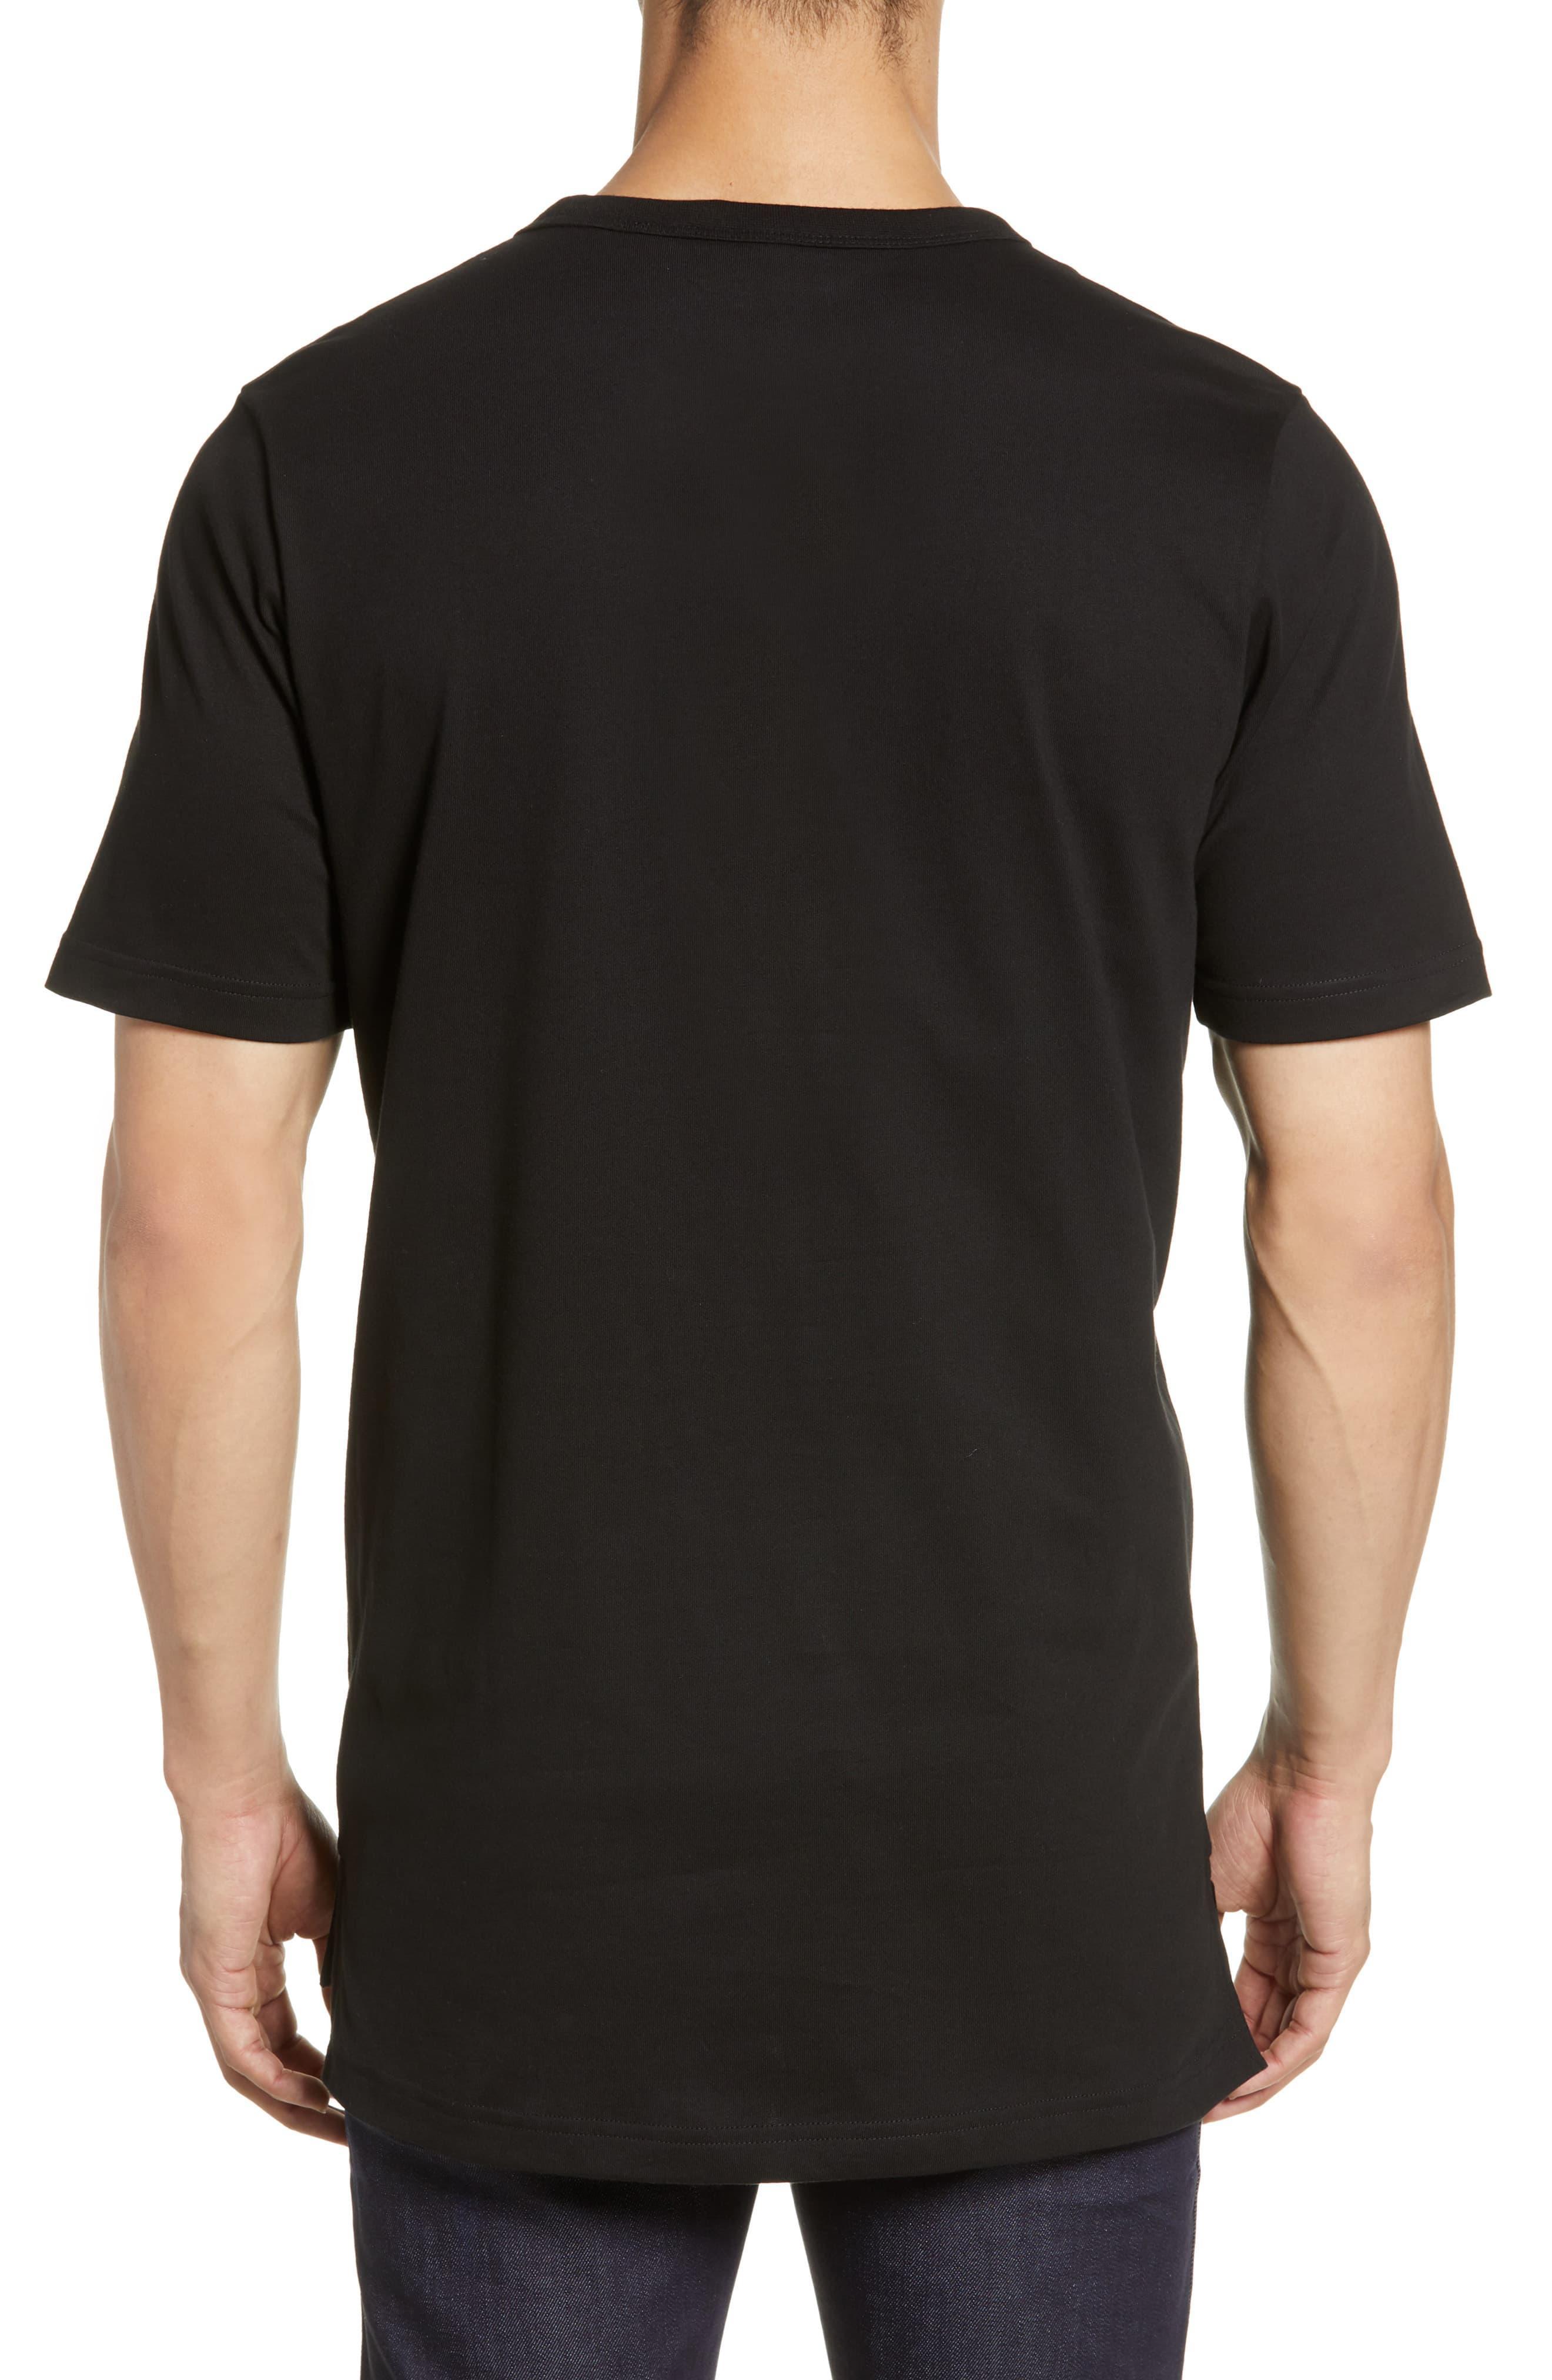 4388e00a Lacoste - Black Premium Transfer Logo T-shirt for Men - Lyst. View  fullscreen